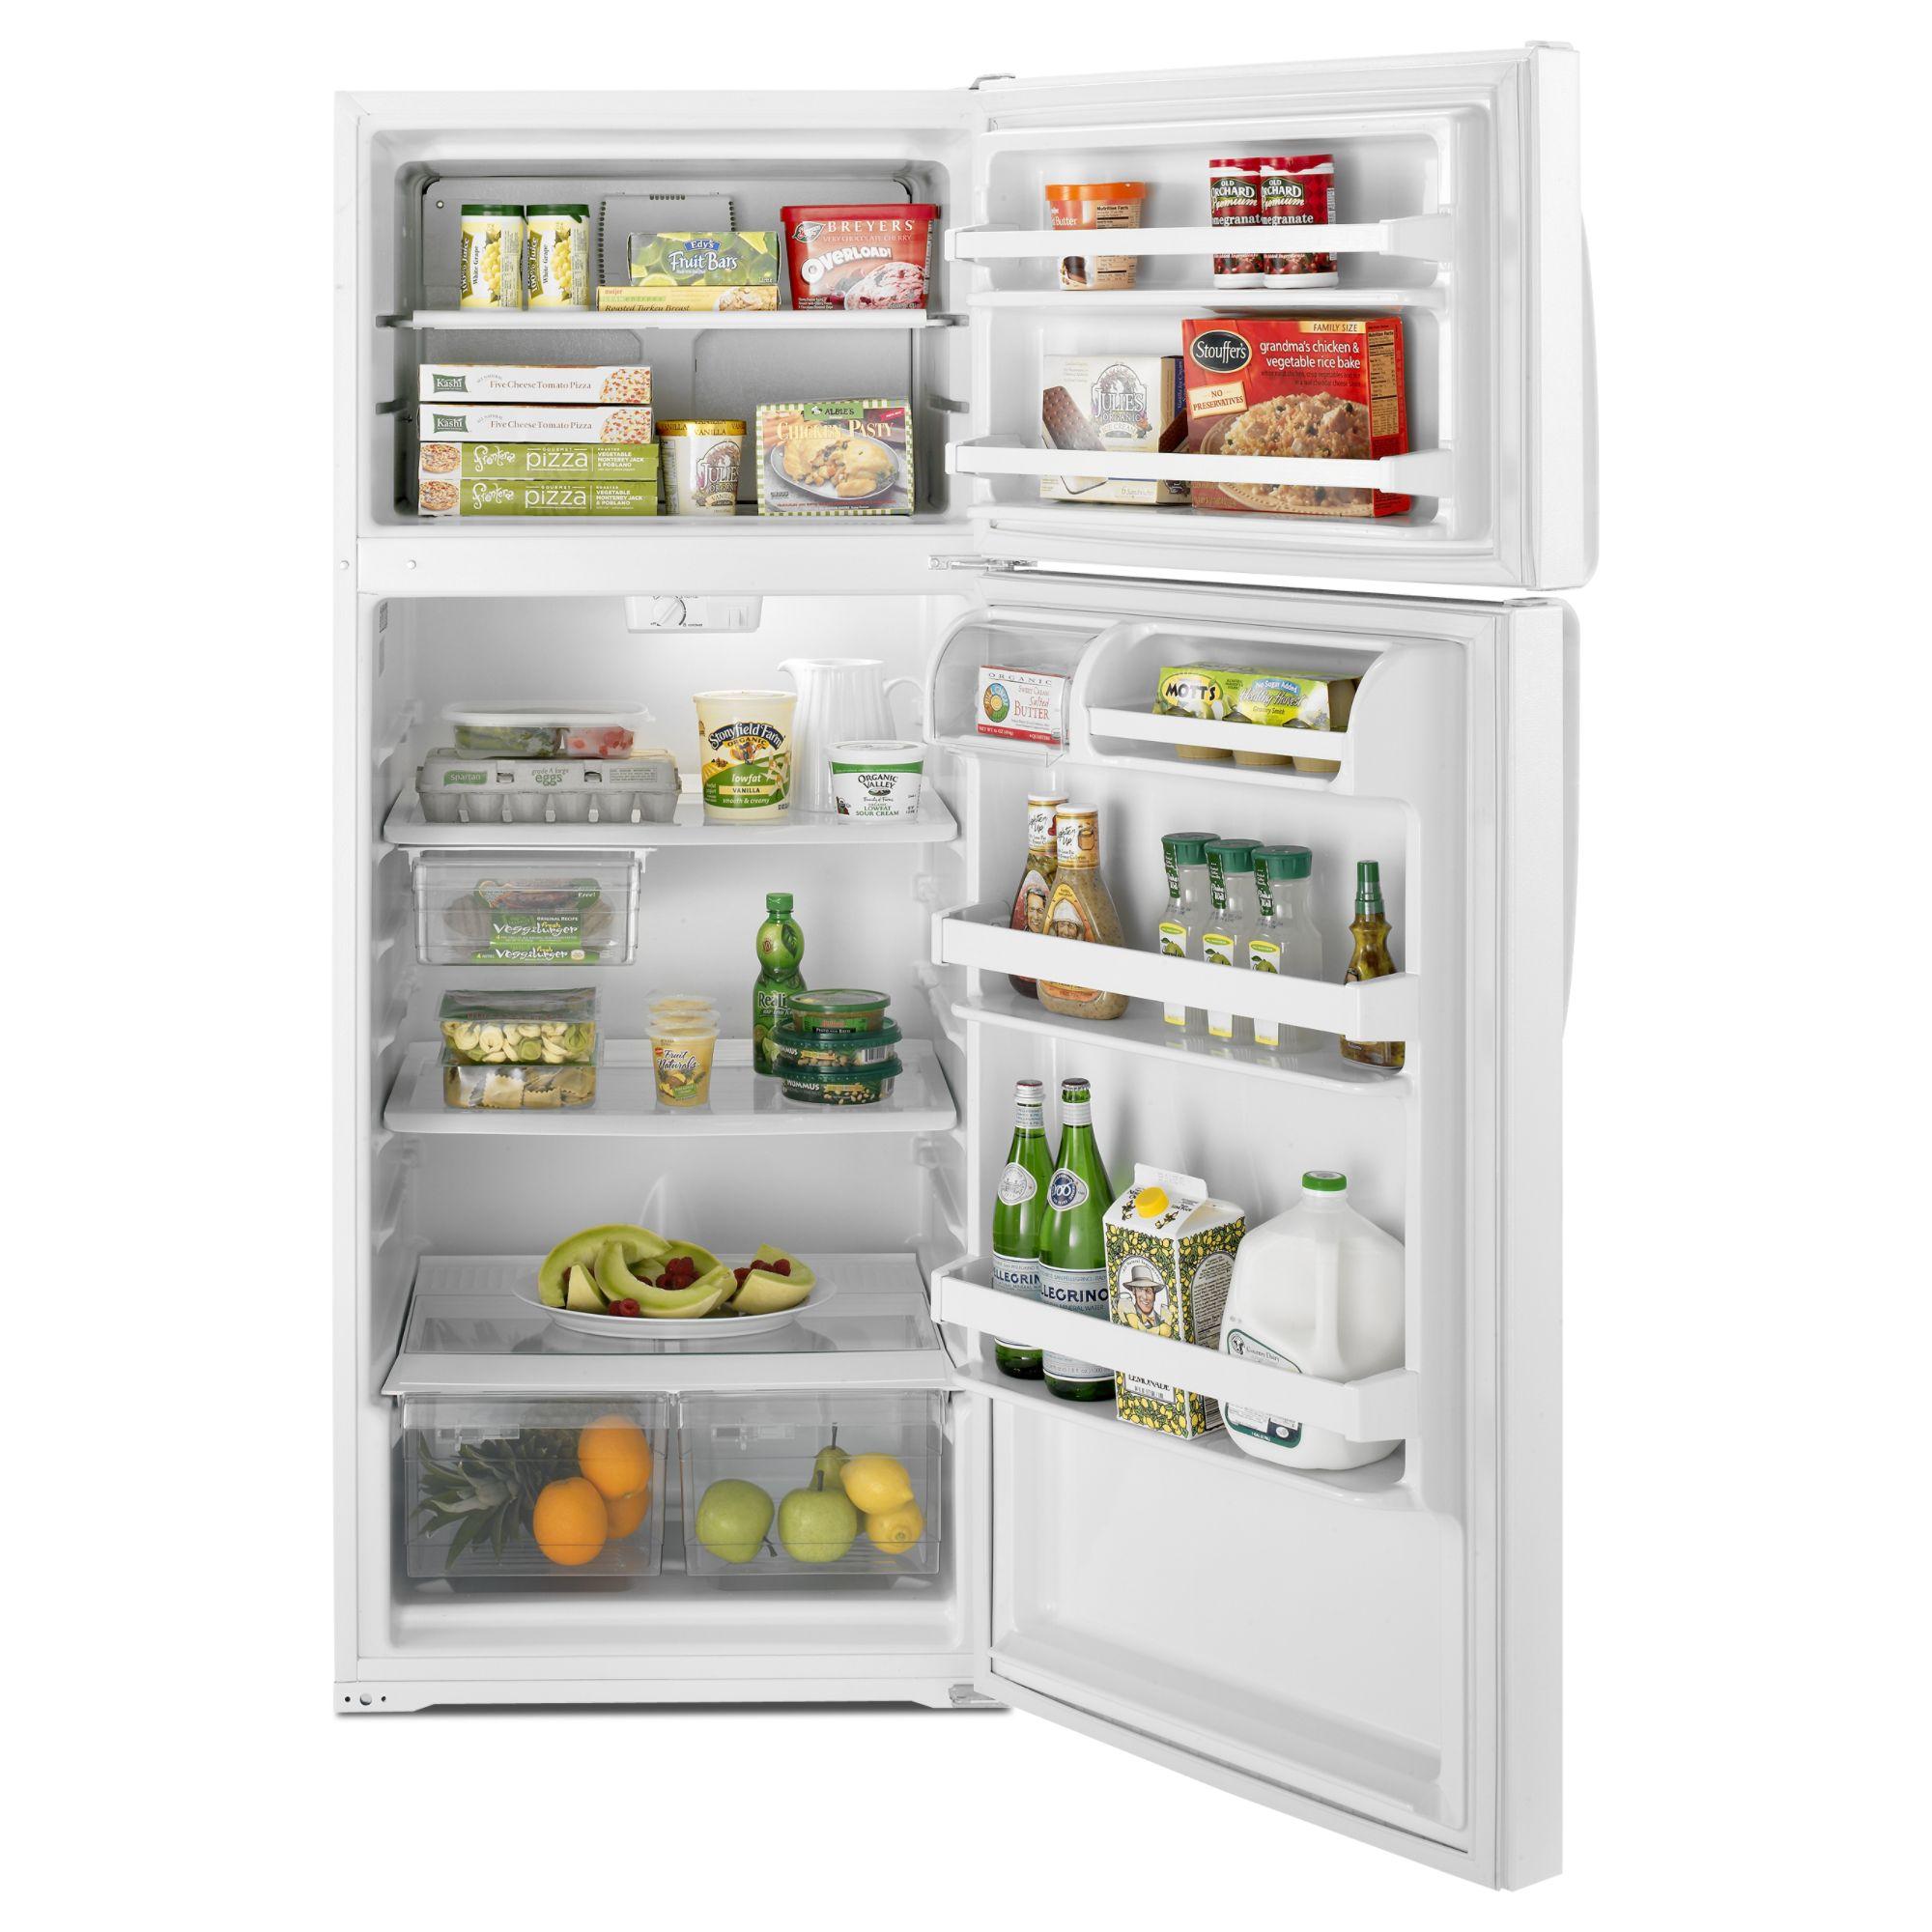 Whirlpool 16 cu. ft. Top-Freezer Refrigerator - White